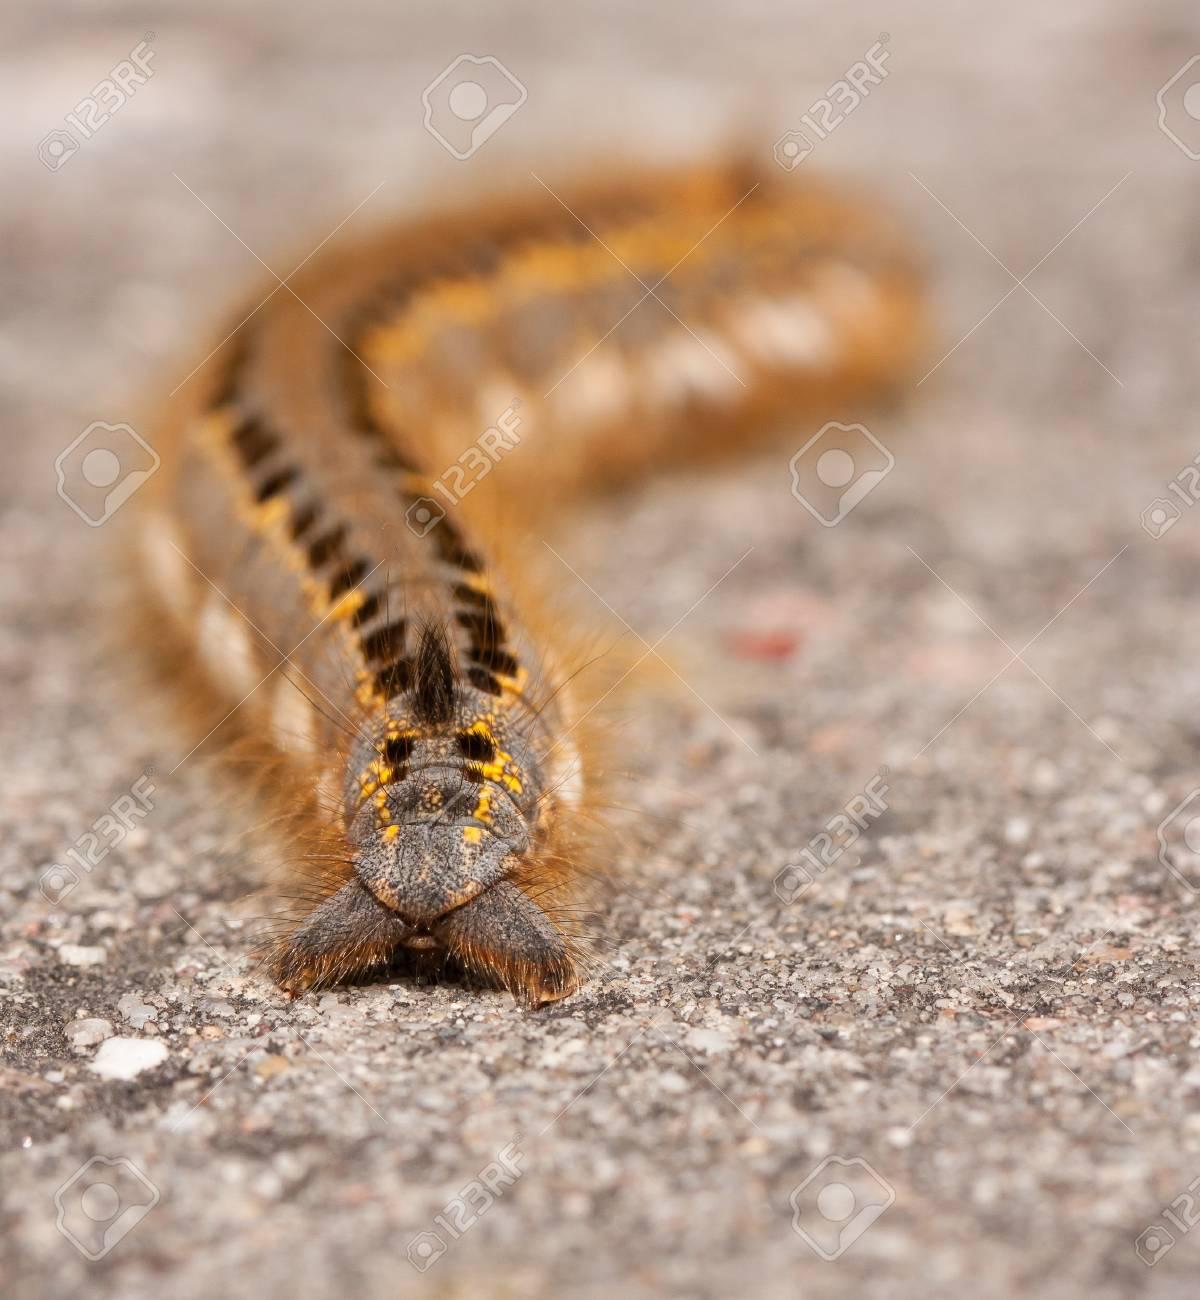 A caterpillar on a stone Stock Photo - 11694293